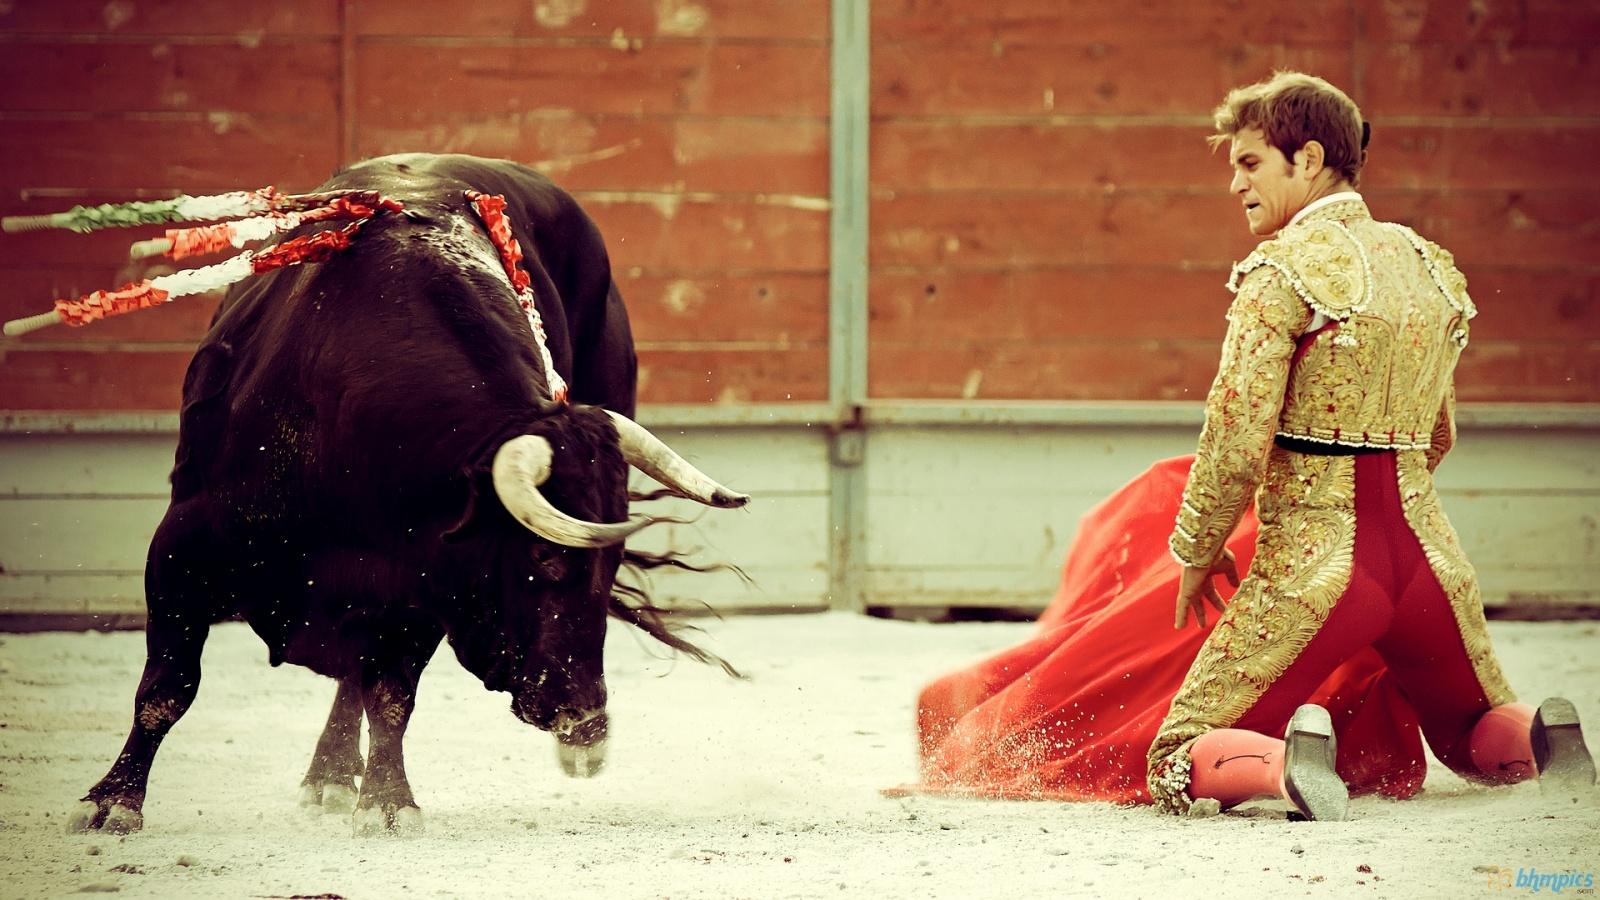 bull fighting 1920x1080 hd - photo #7